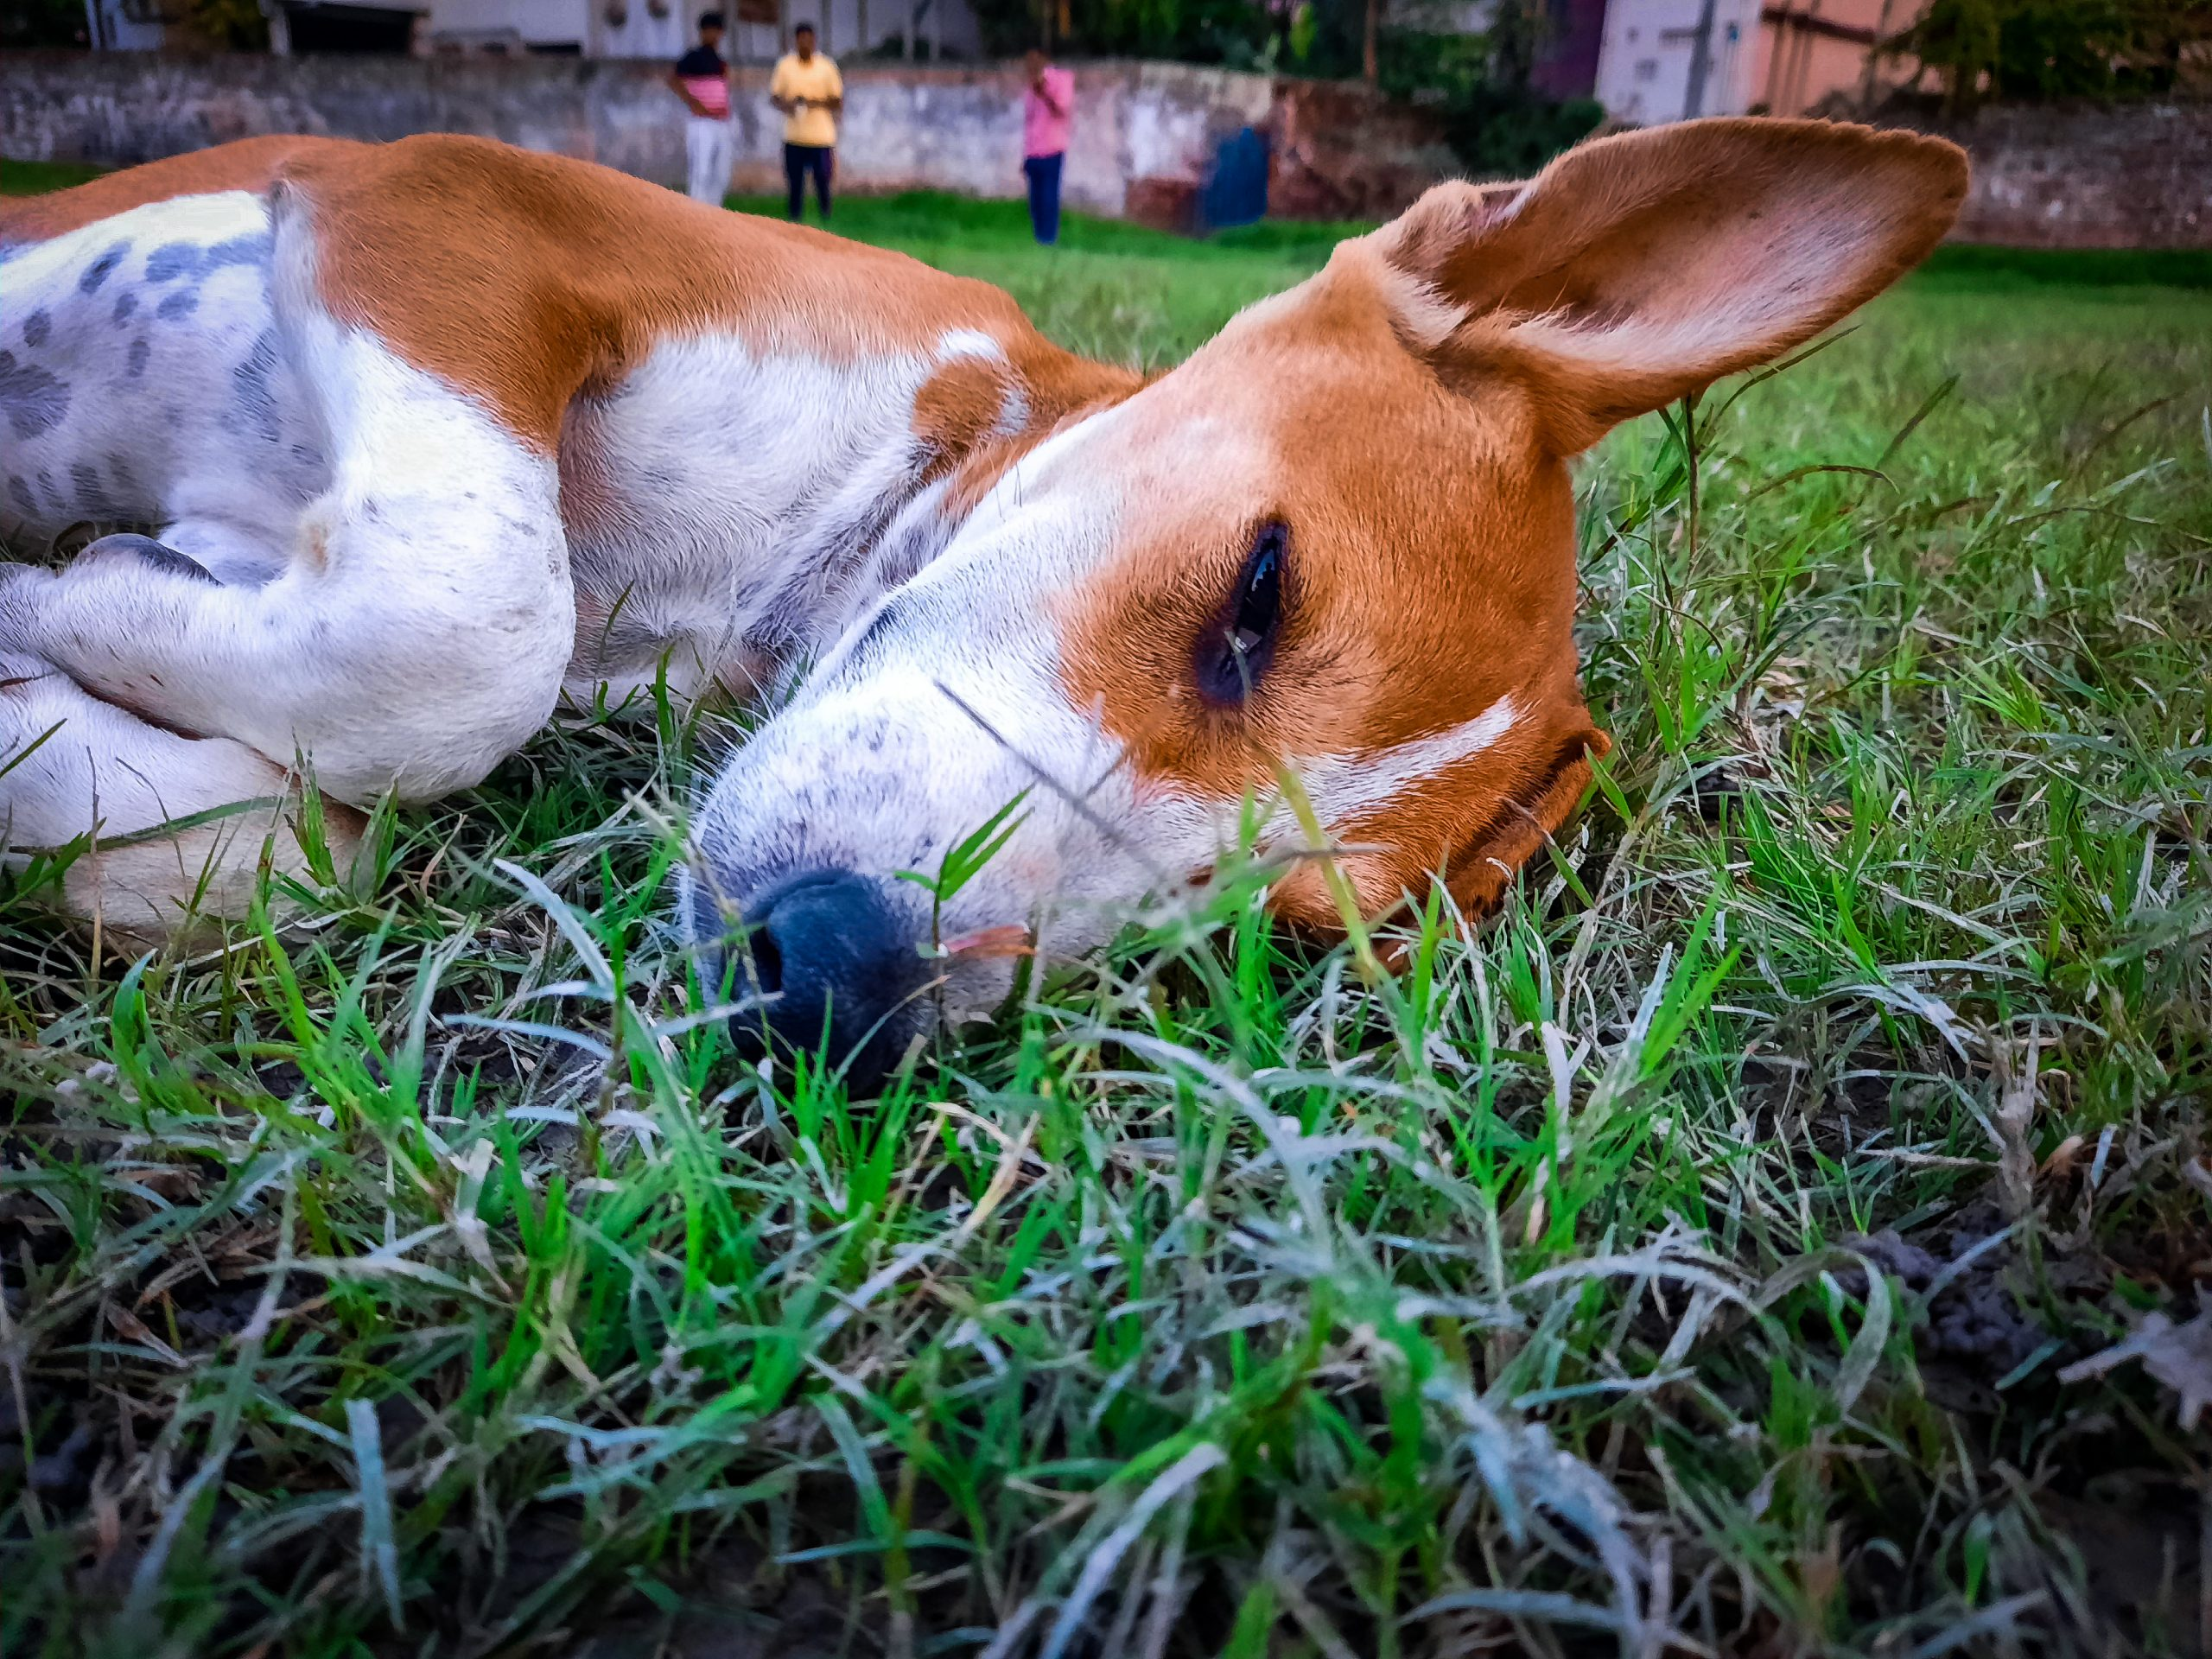 A beautiful baby dog